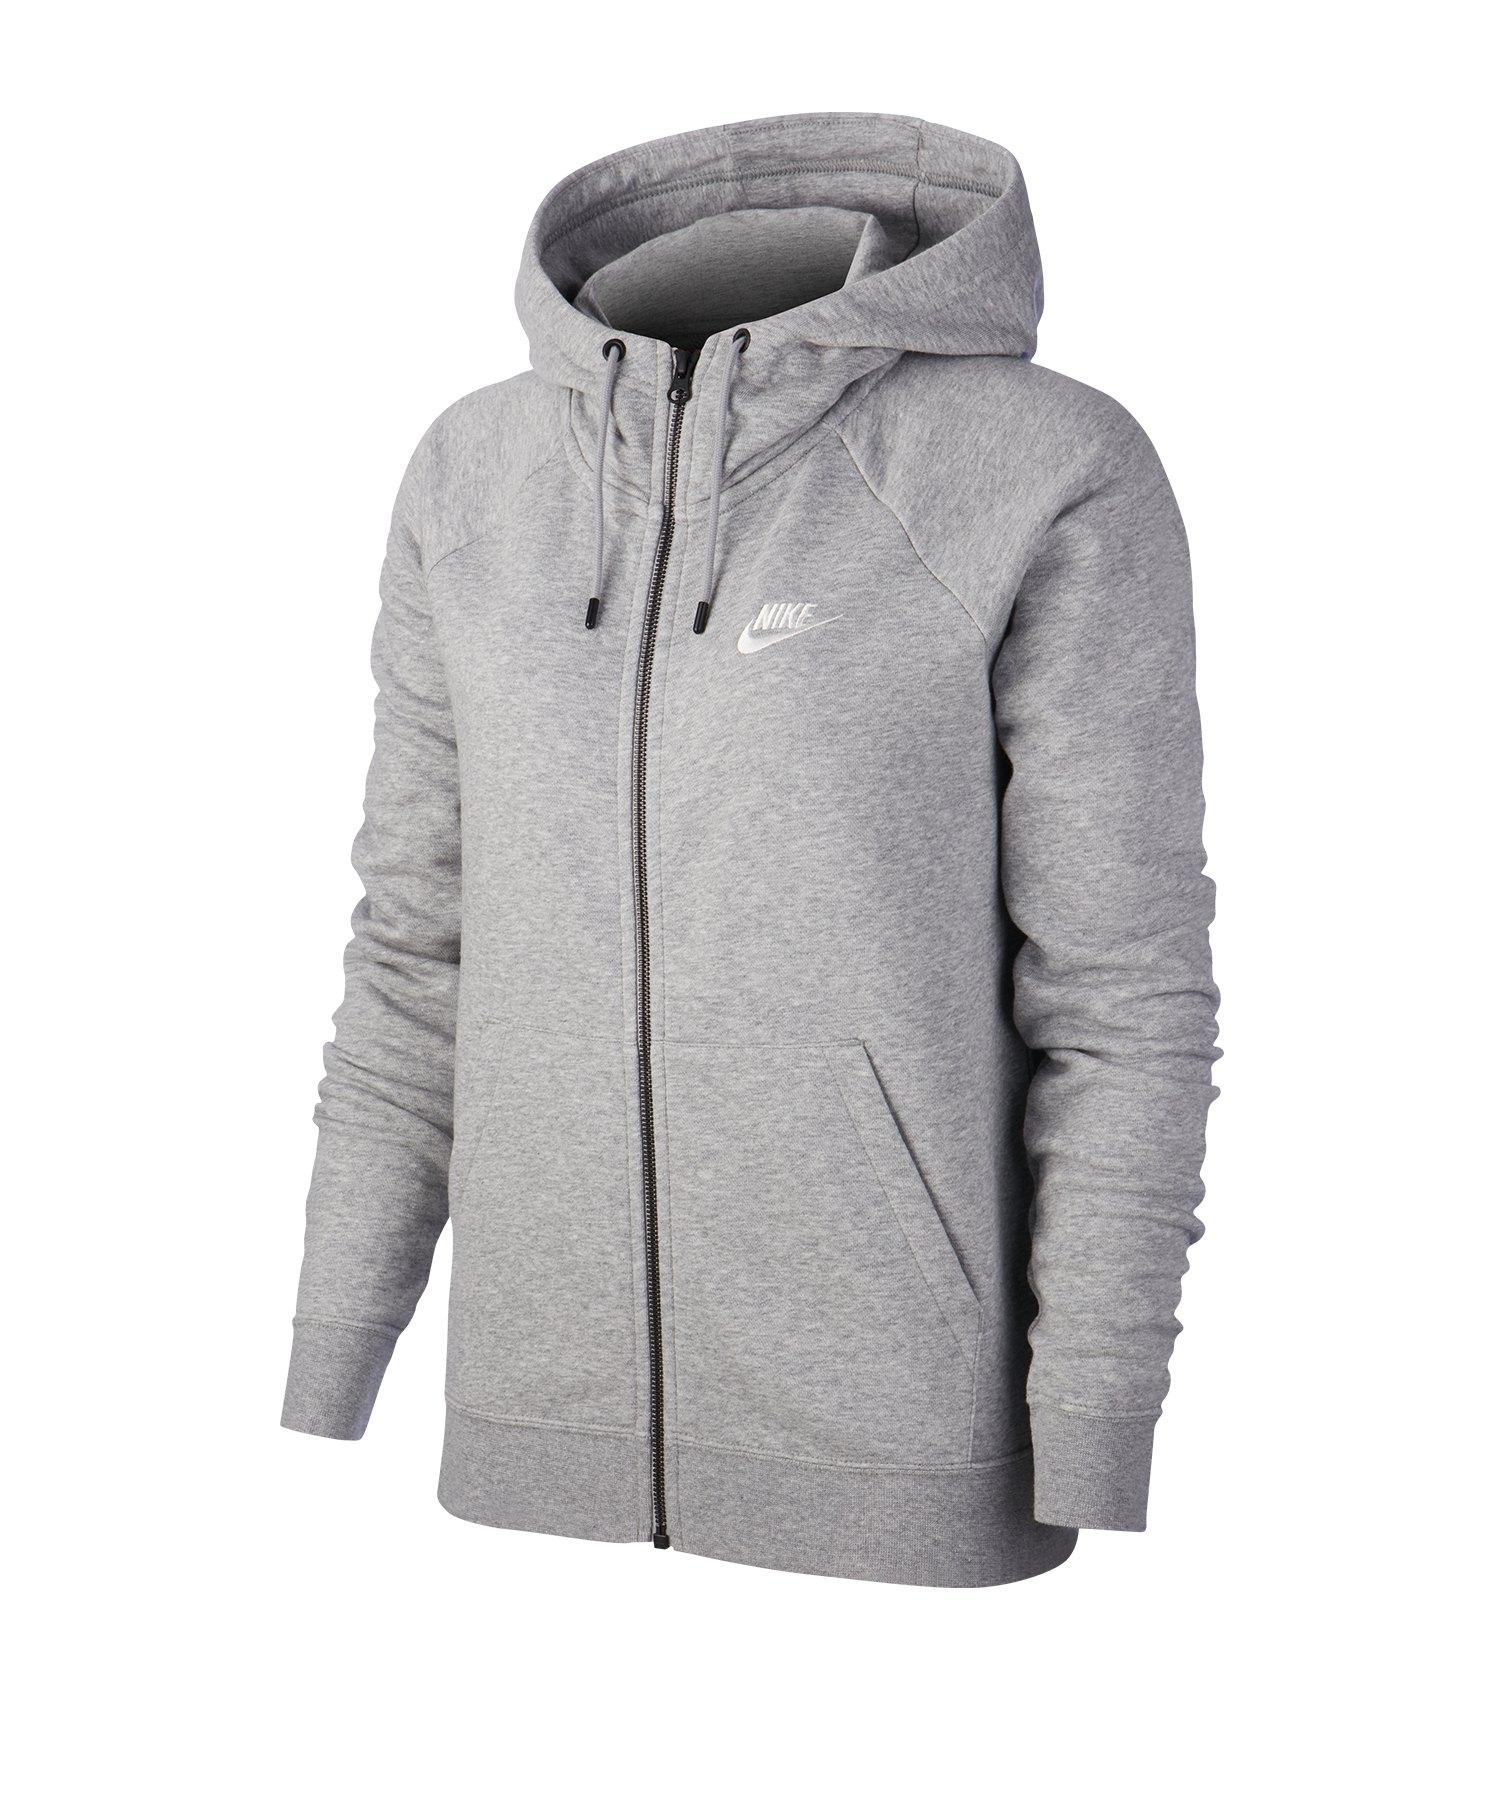 Nike Essential Fleece Kapuzenjacke Damen Grau F063 - grau